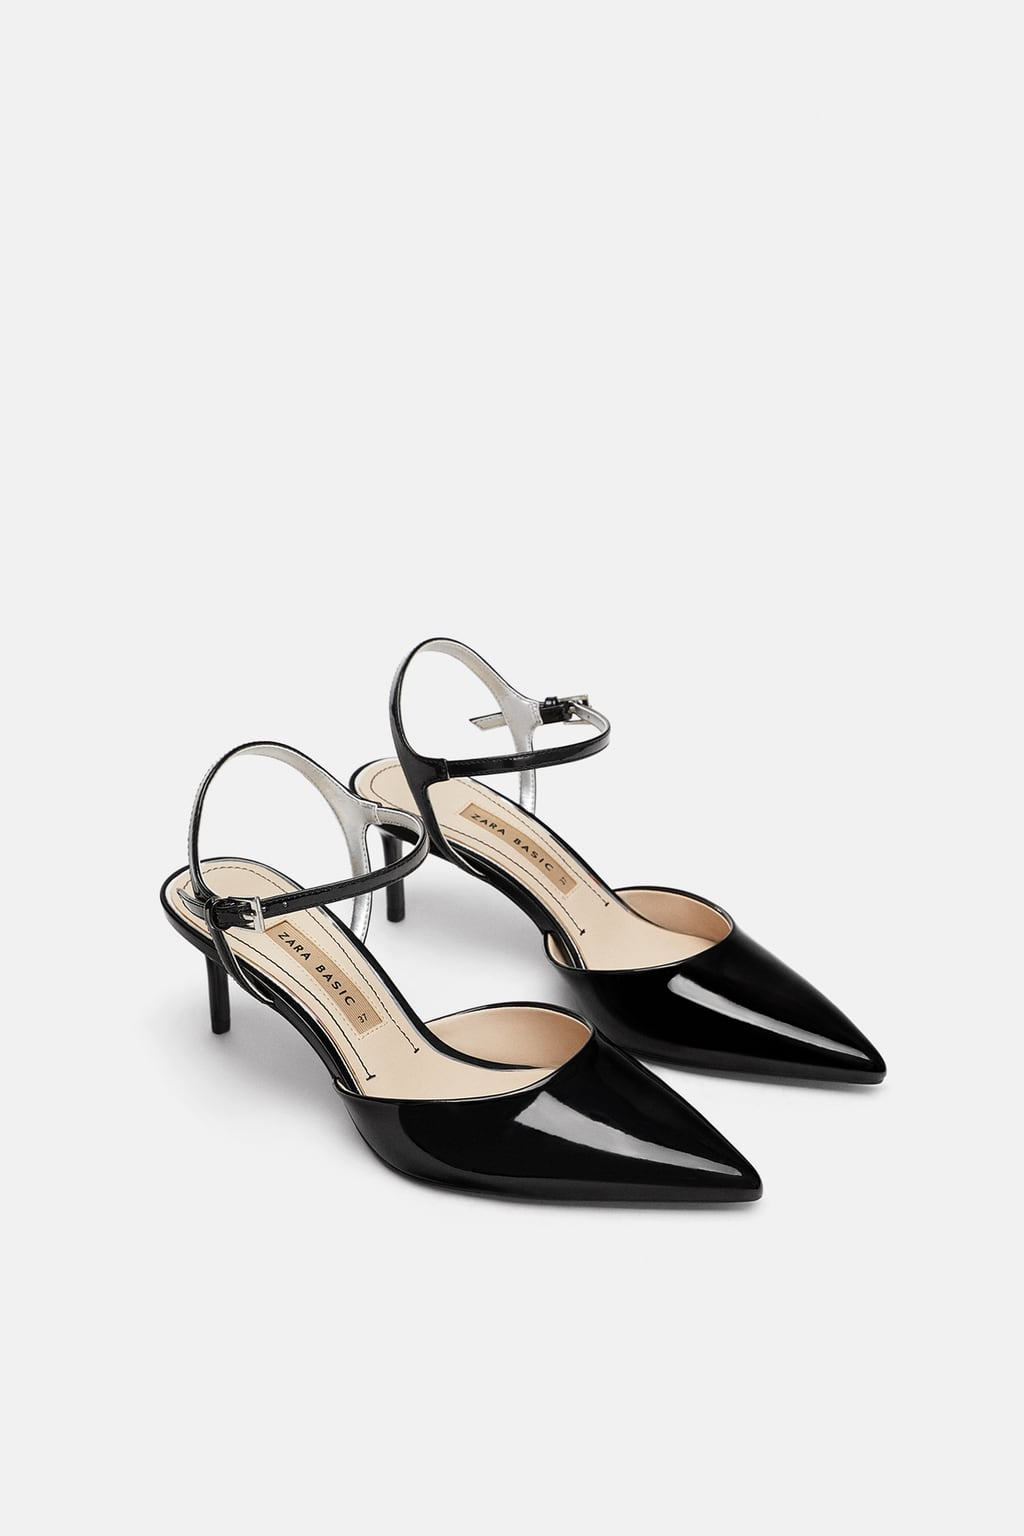 Slingback Heels - £19.99